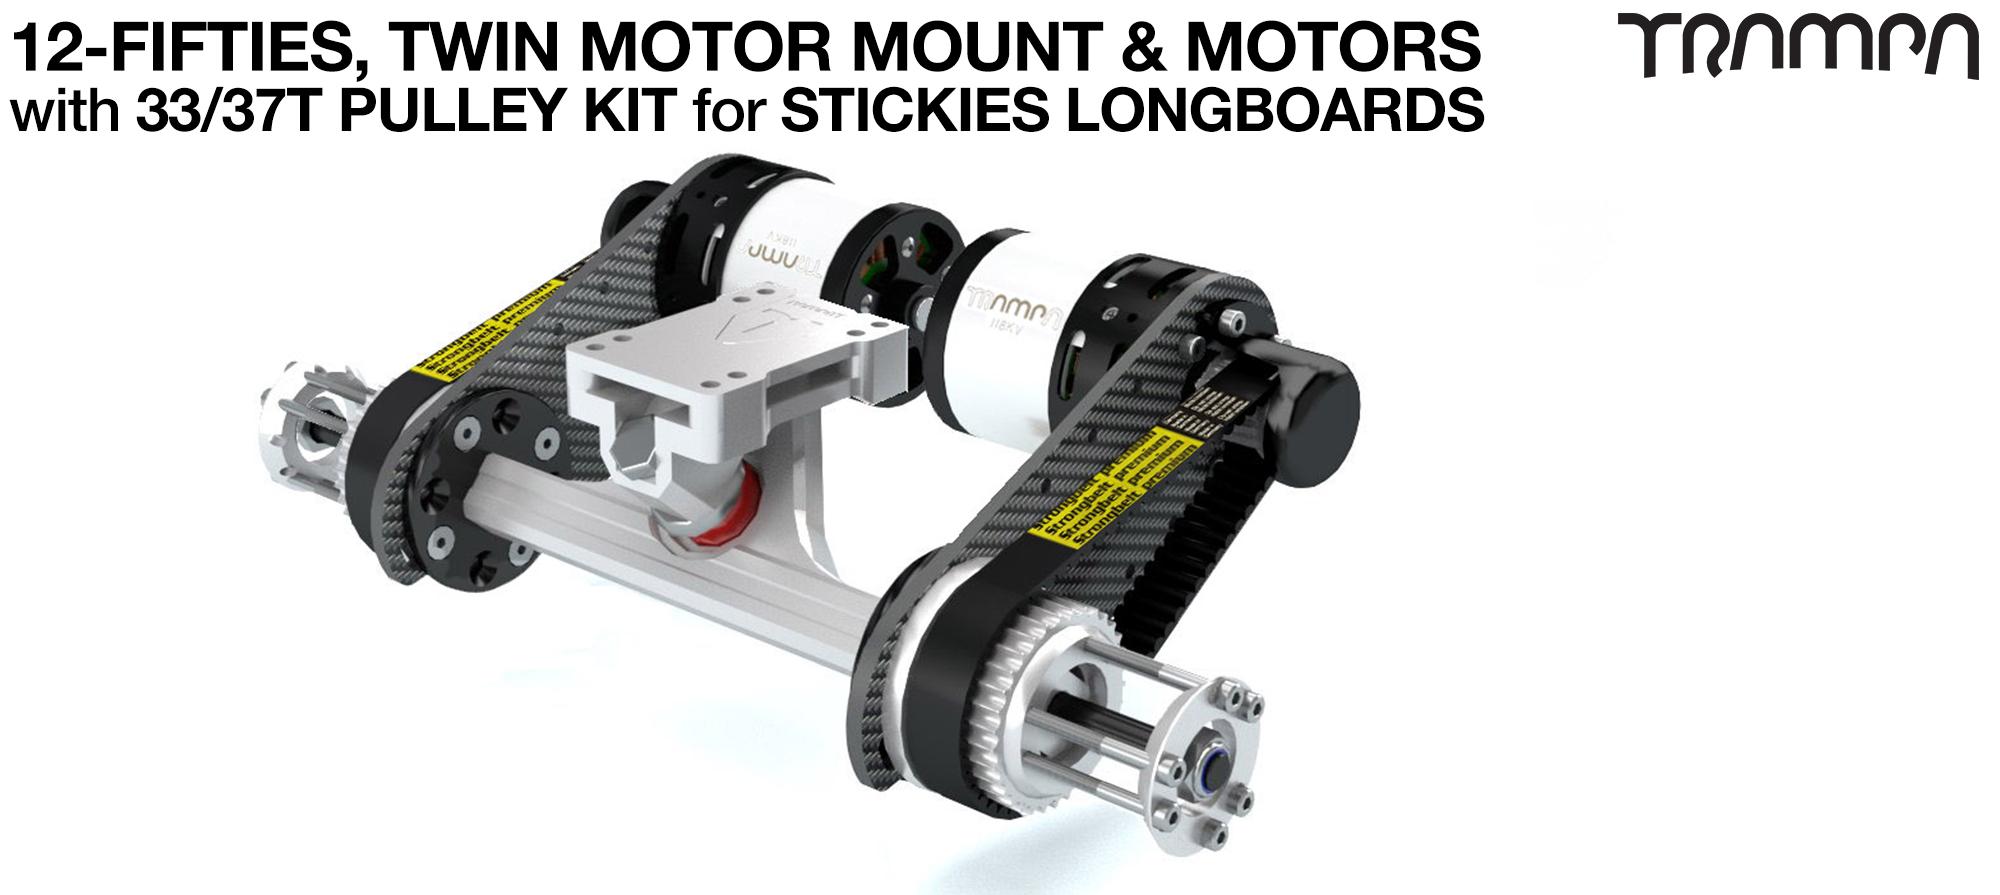 TWIN Original 12FiFties Motor mount & 33/37 Tooth Pulley Kit with MOTOR & 2x 12FiFties Trucks